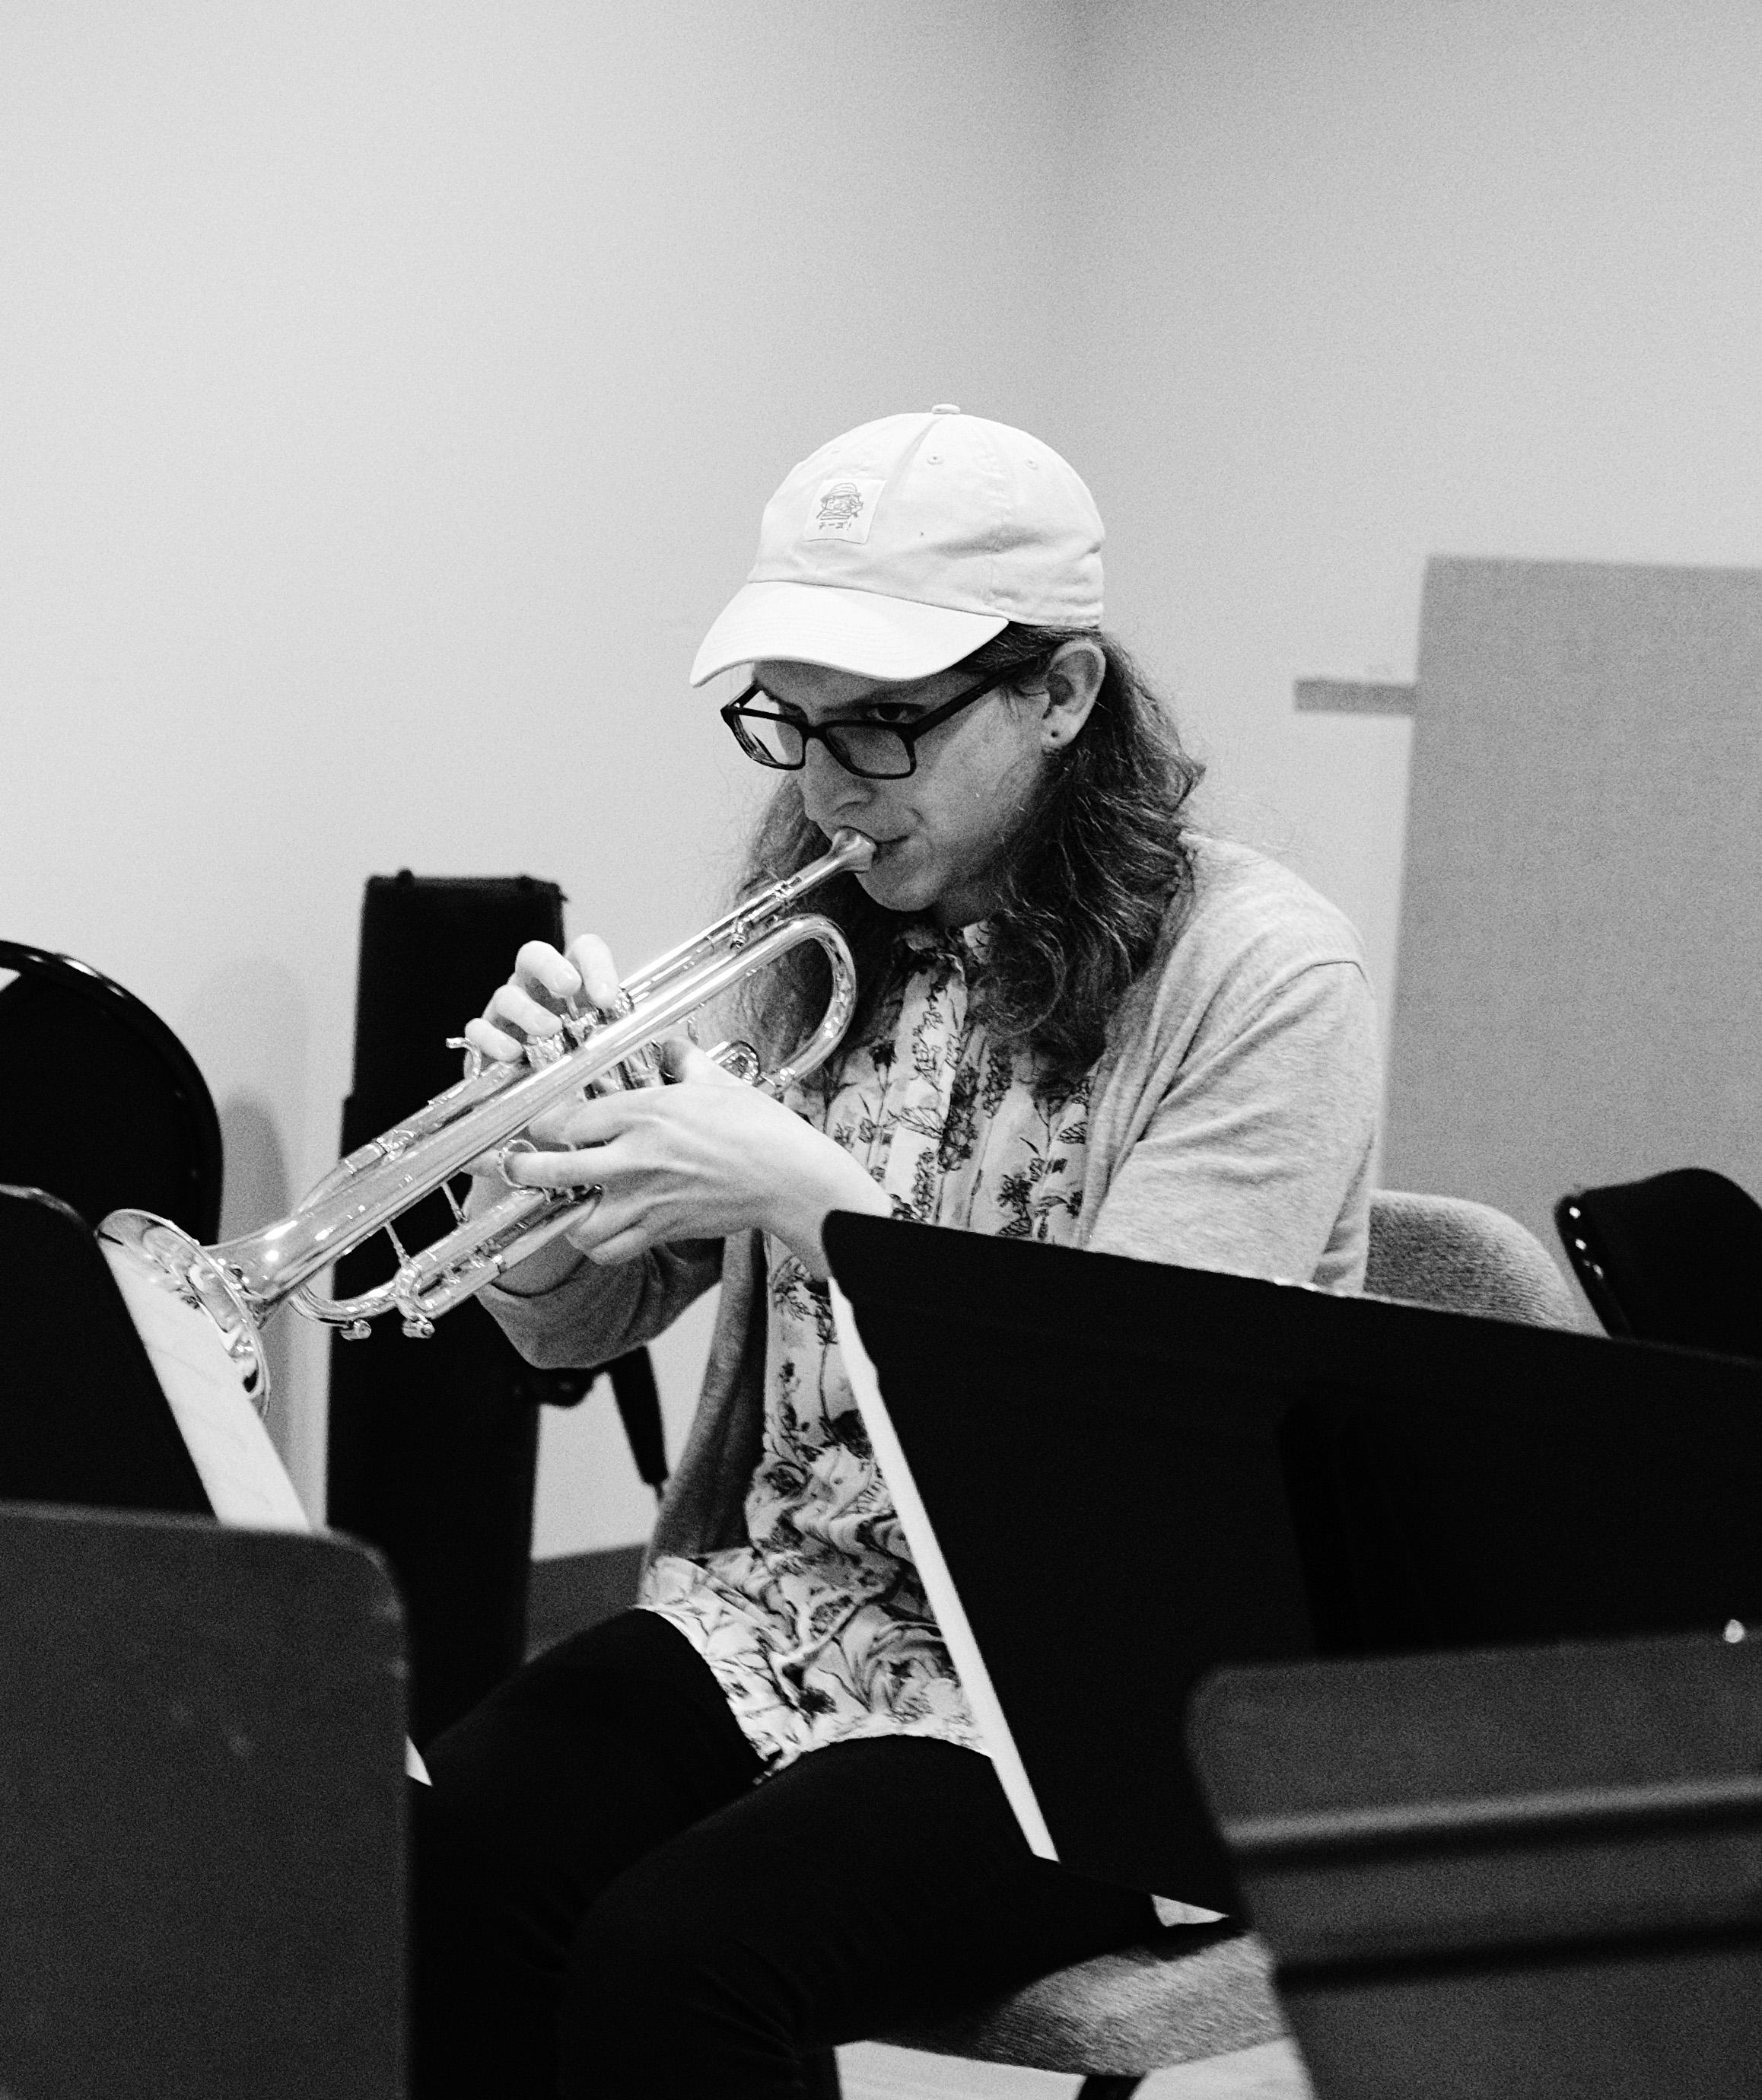 DevinClara_trumpet1.jpg